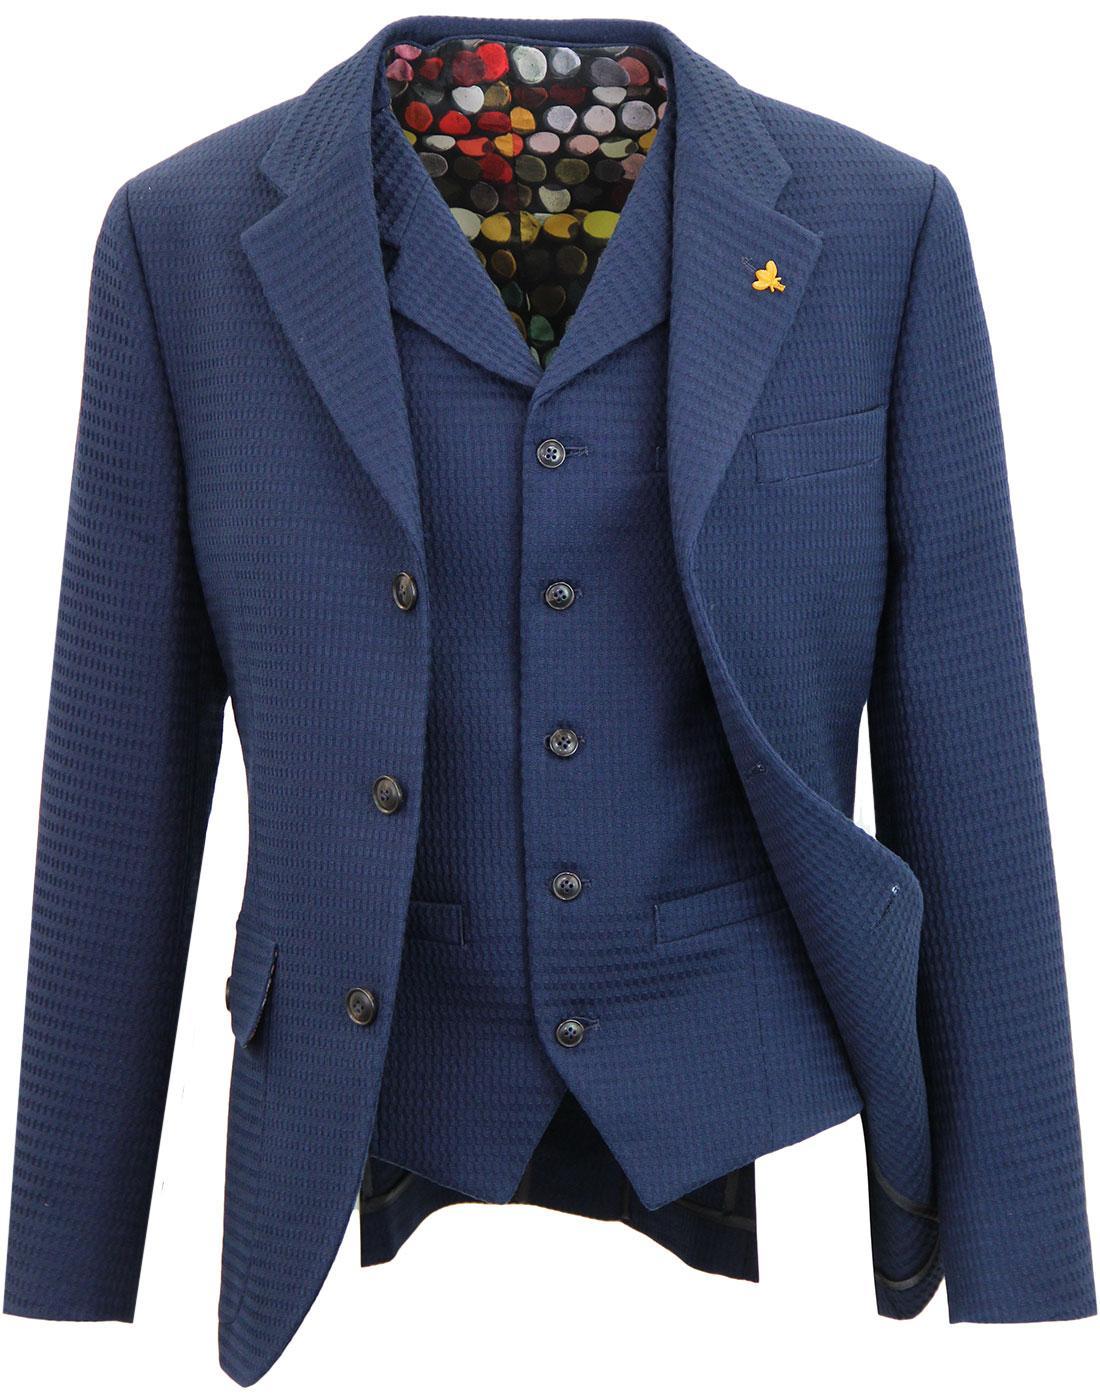 GIBSON LONDON Matching Mod Navy Blazer & Waistcoat